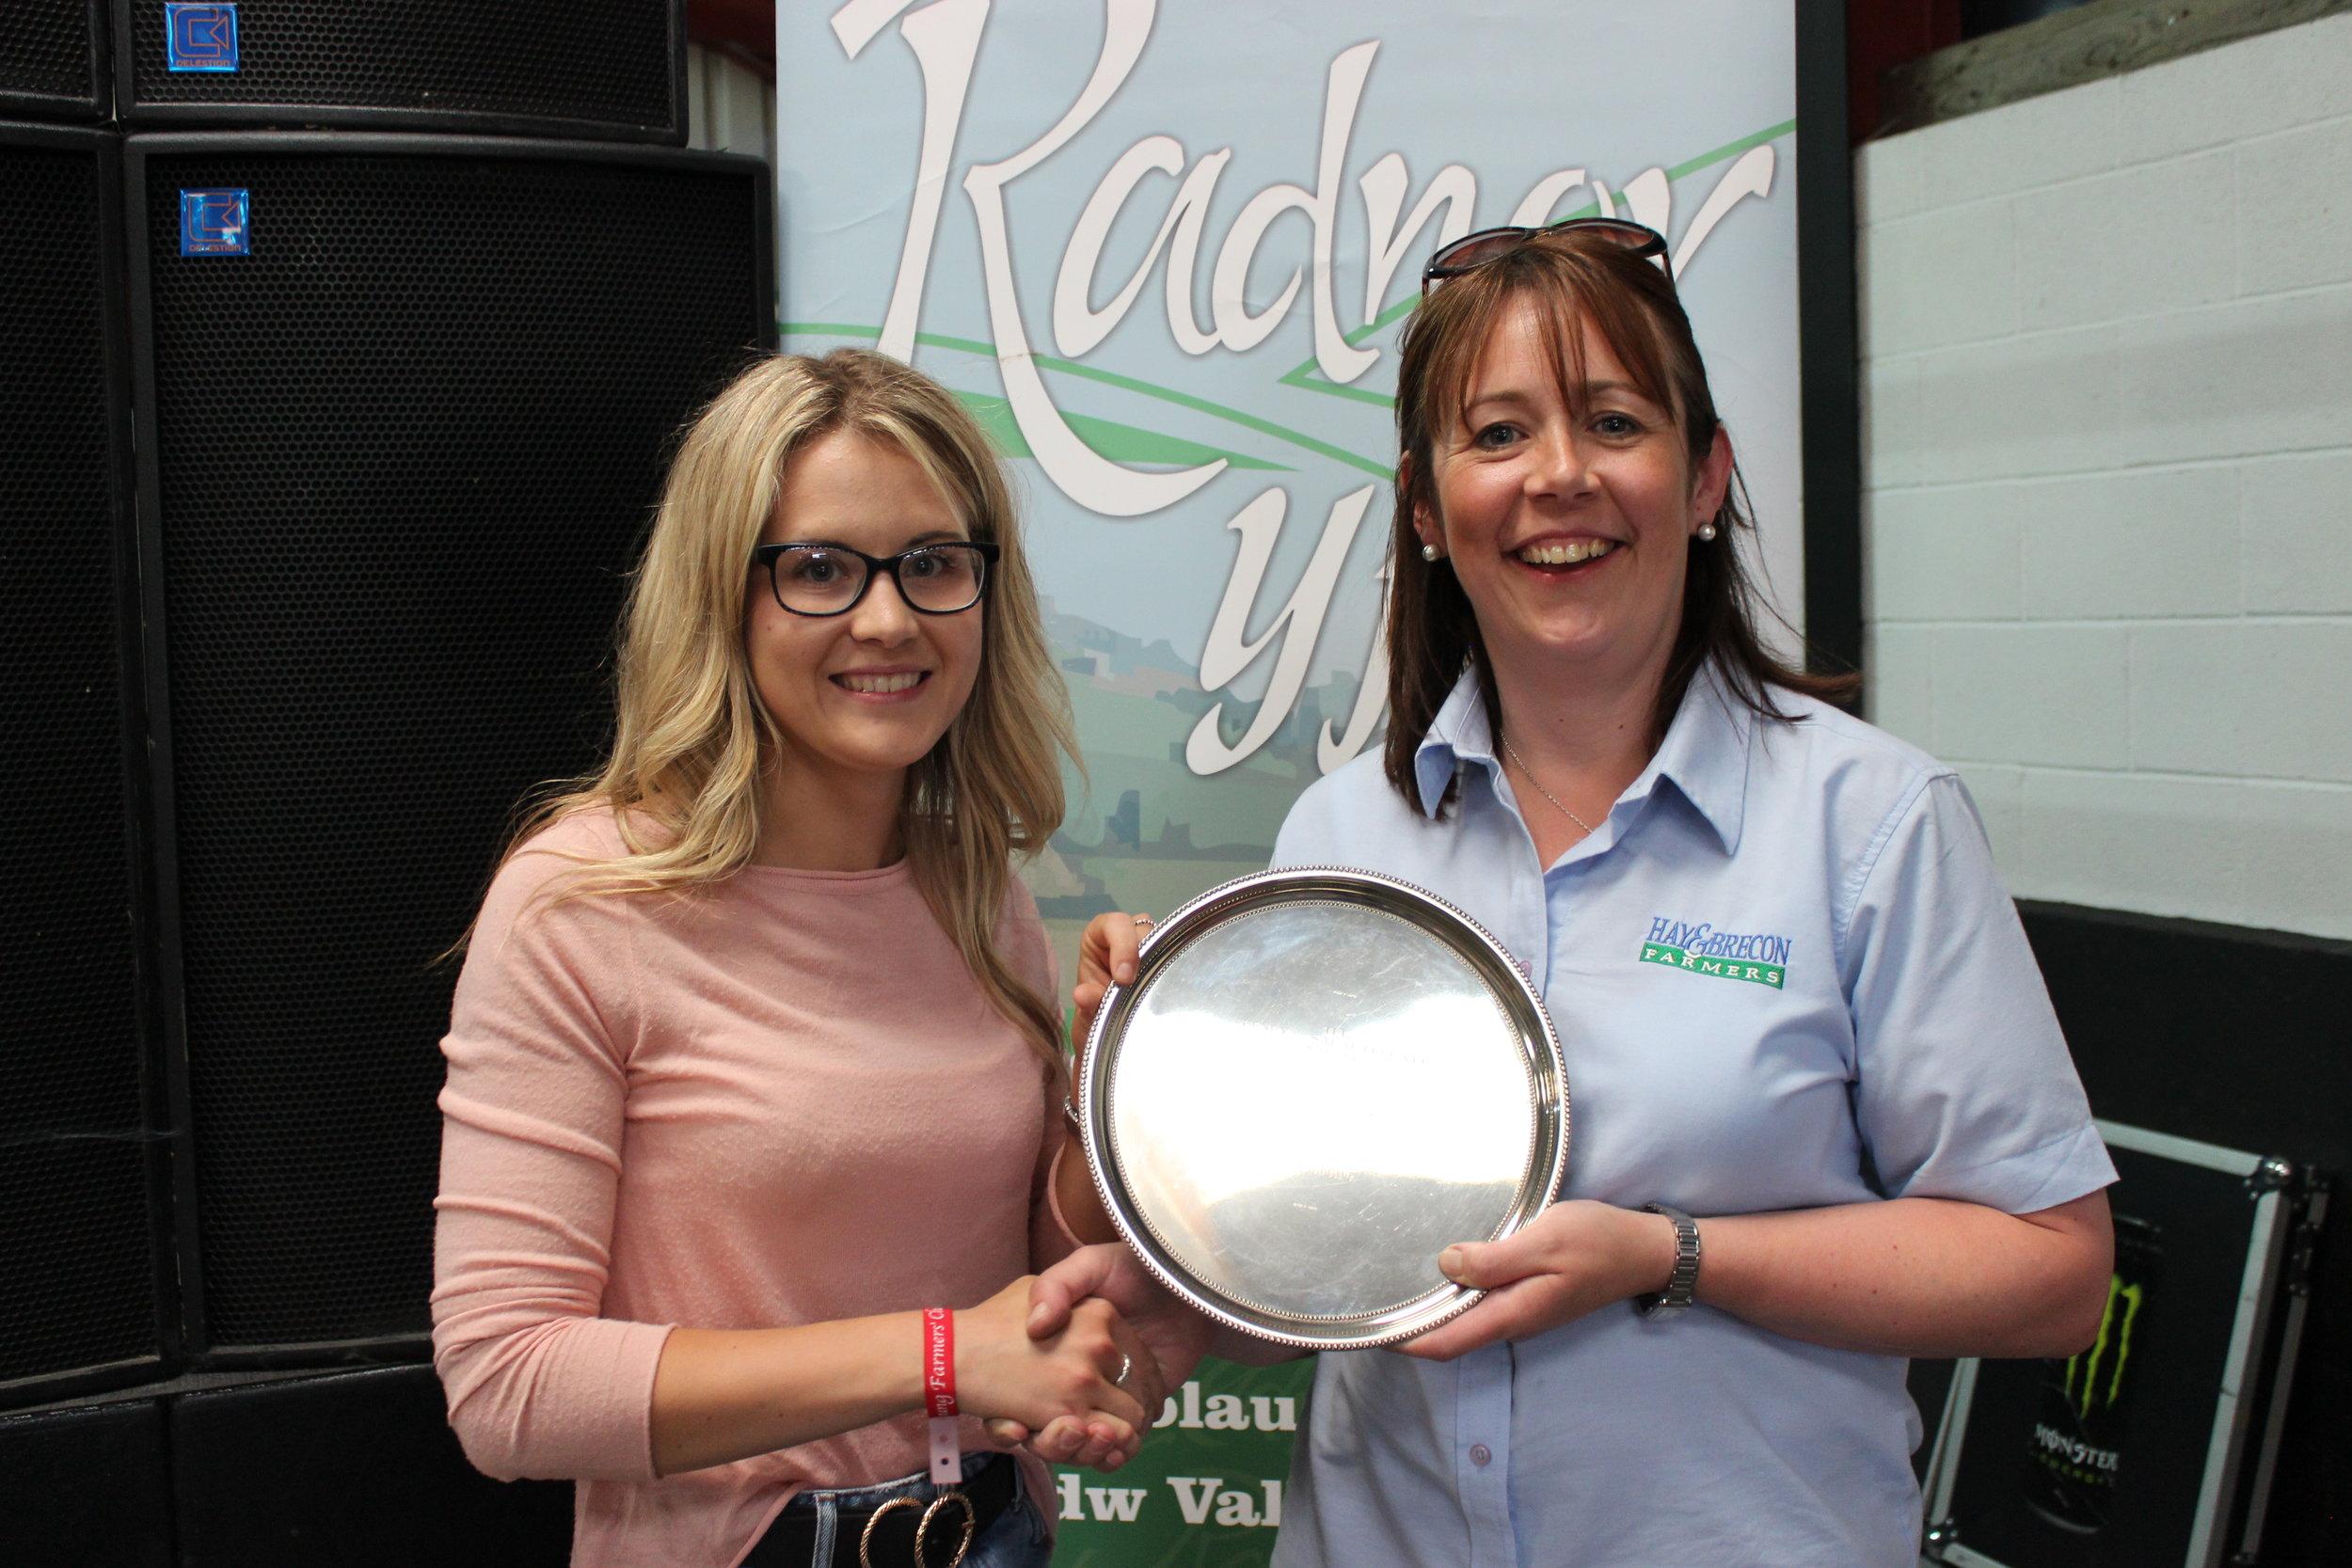 Laura Watson, Llanbadarn Fynydd YFC - Sarah Froggat Trophy / Highest mark attained by a female member in Stockjudging Competitions